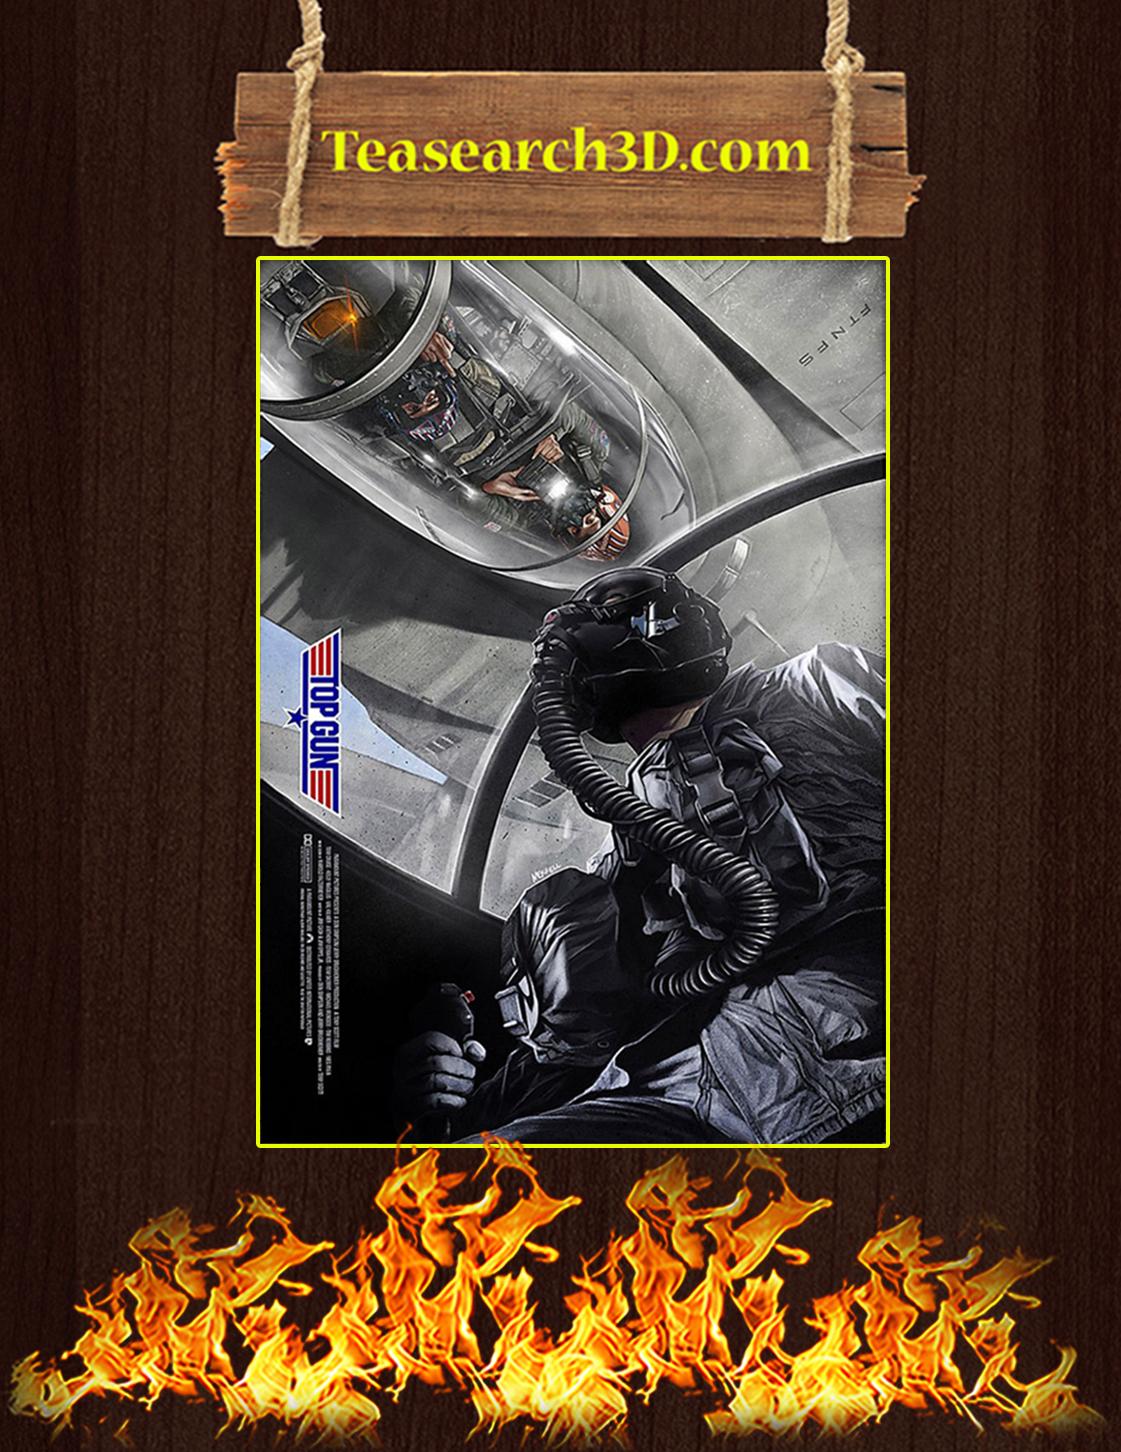 Top gun flyby poster A3